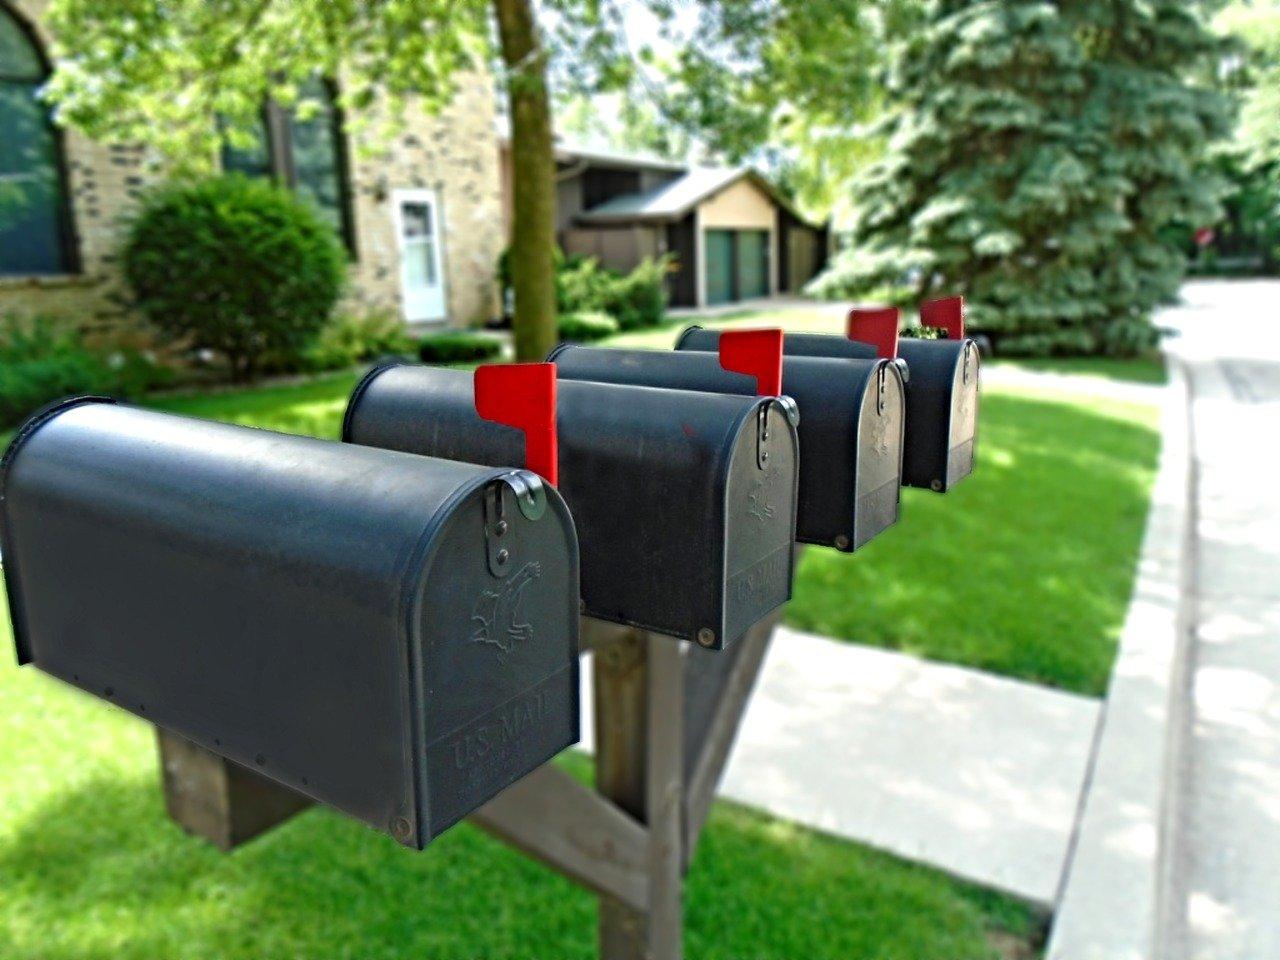 United States postal address change